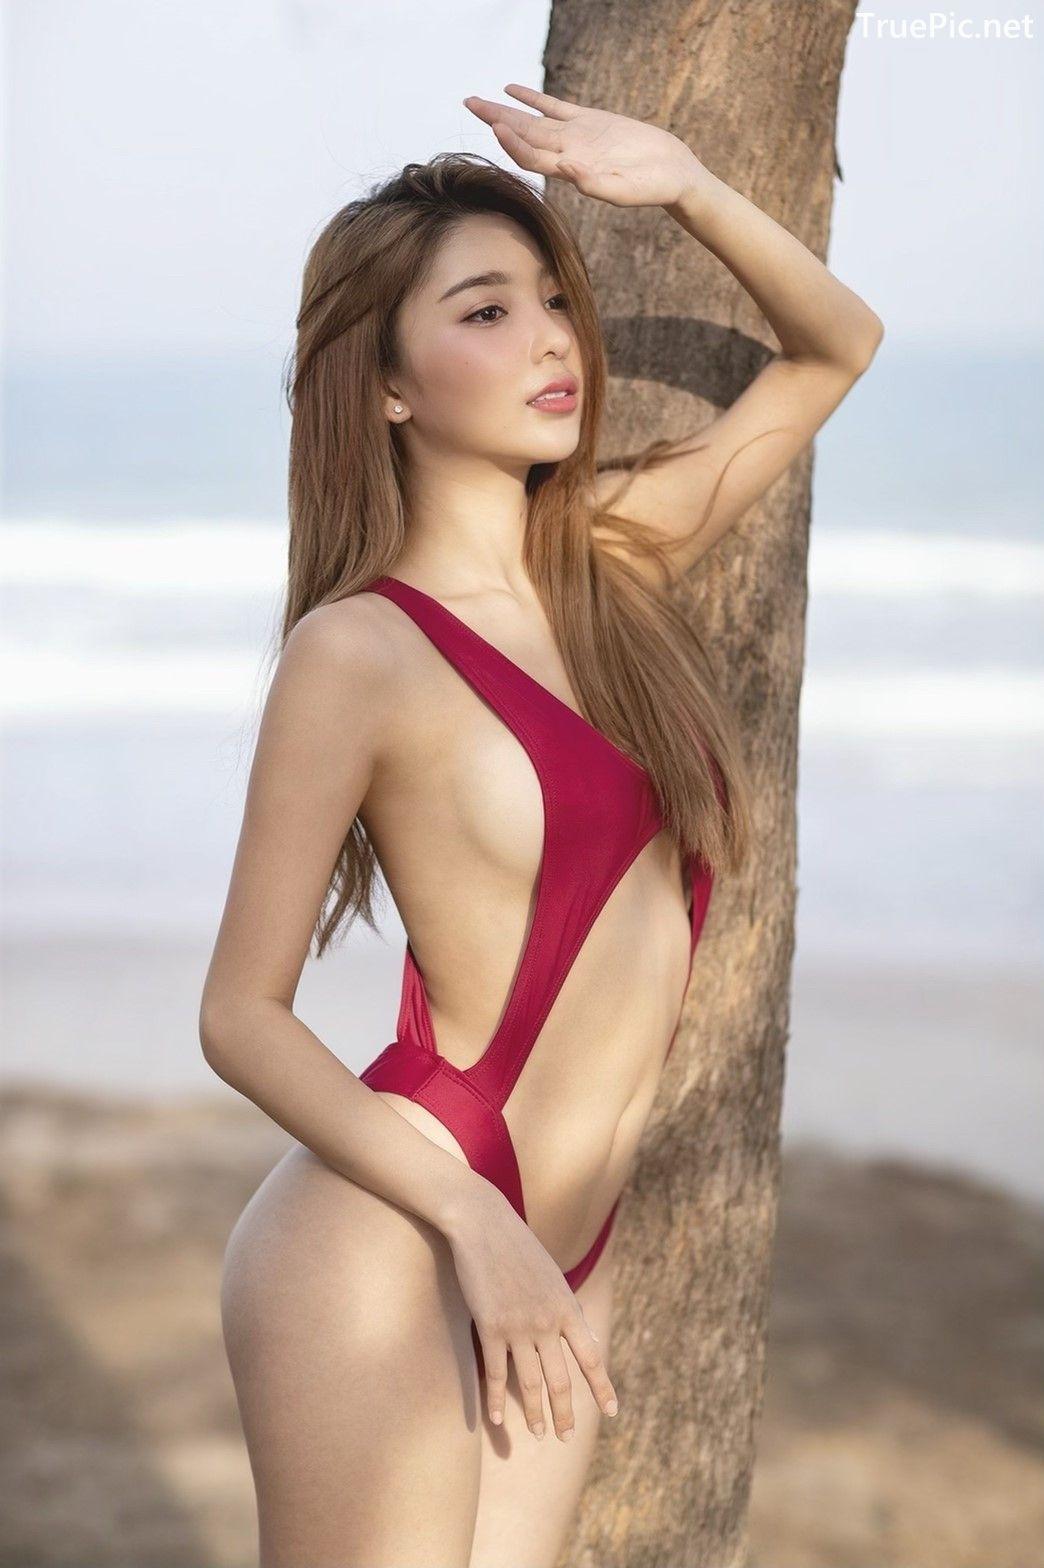 Image Thailand Model – Printlaaplus Zhaengchohm - Mixed Salad Bikini - TruePic.net - Picture-9